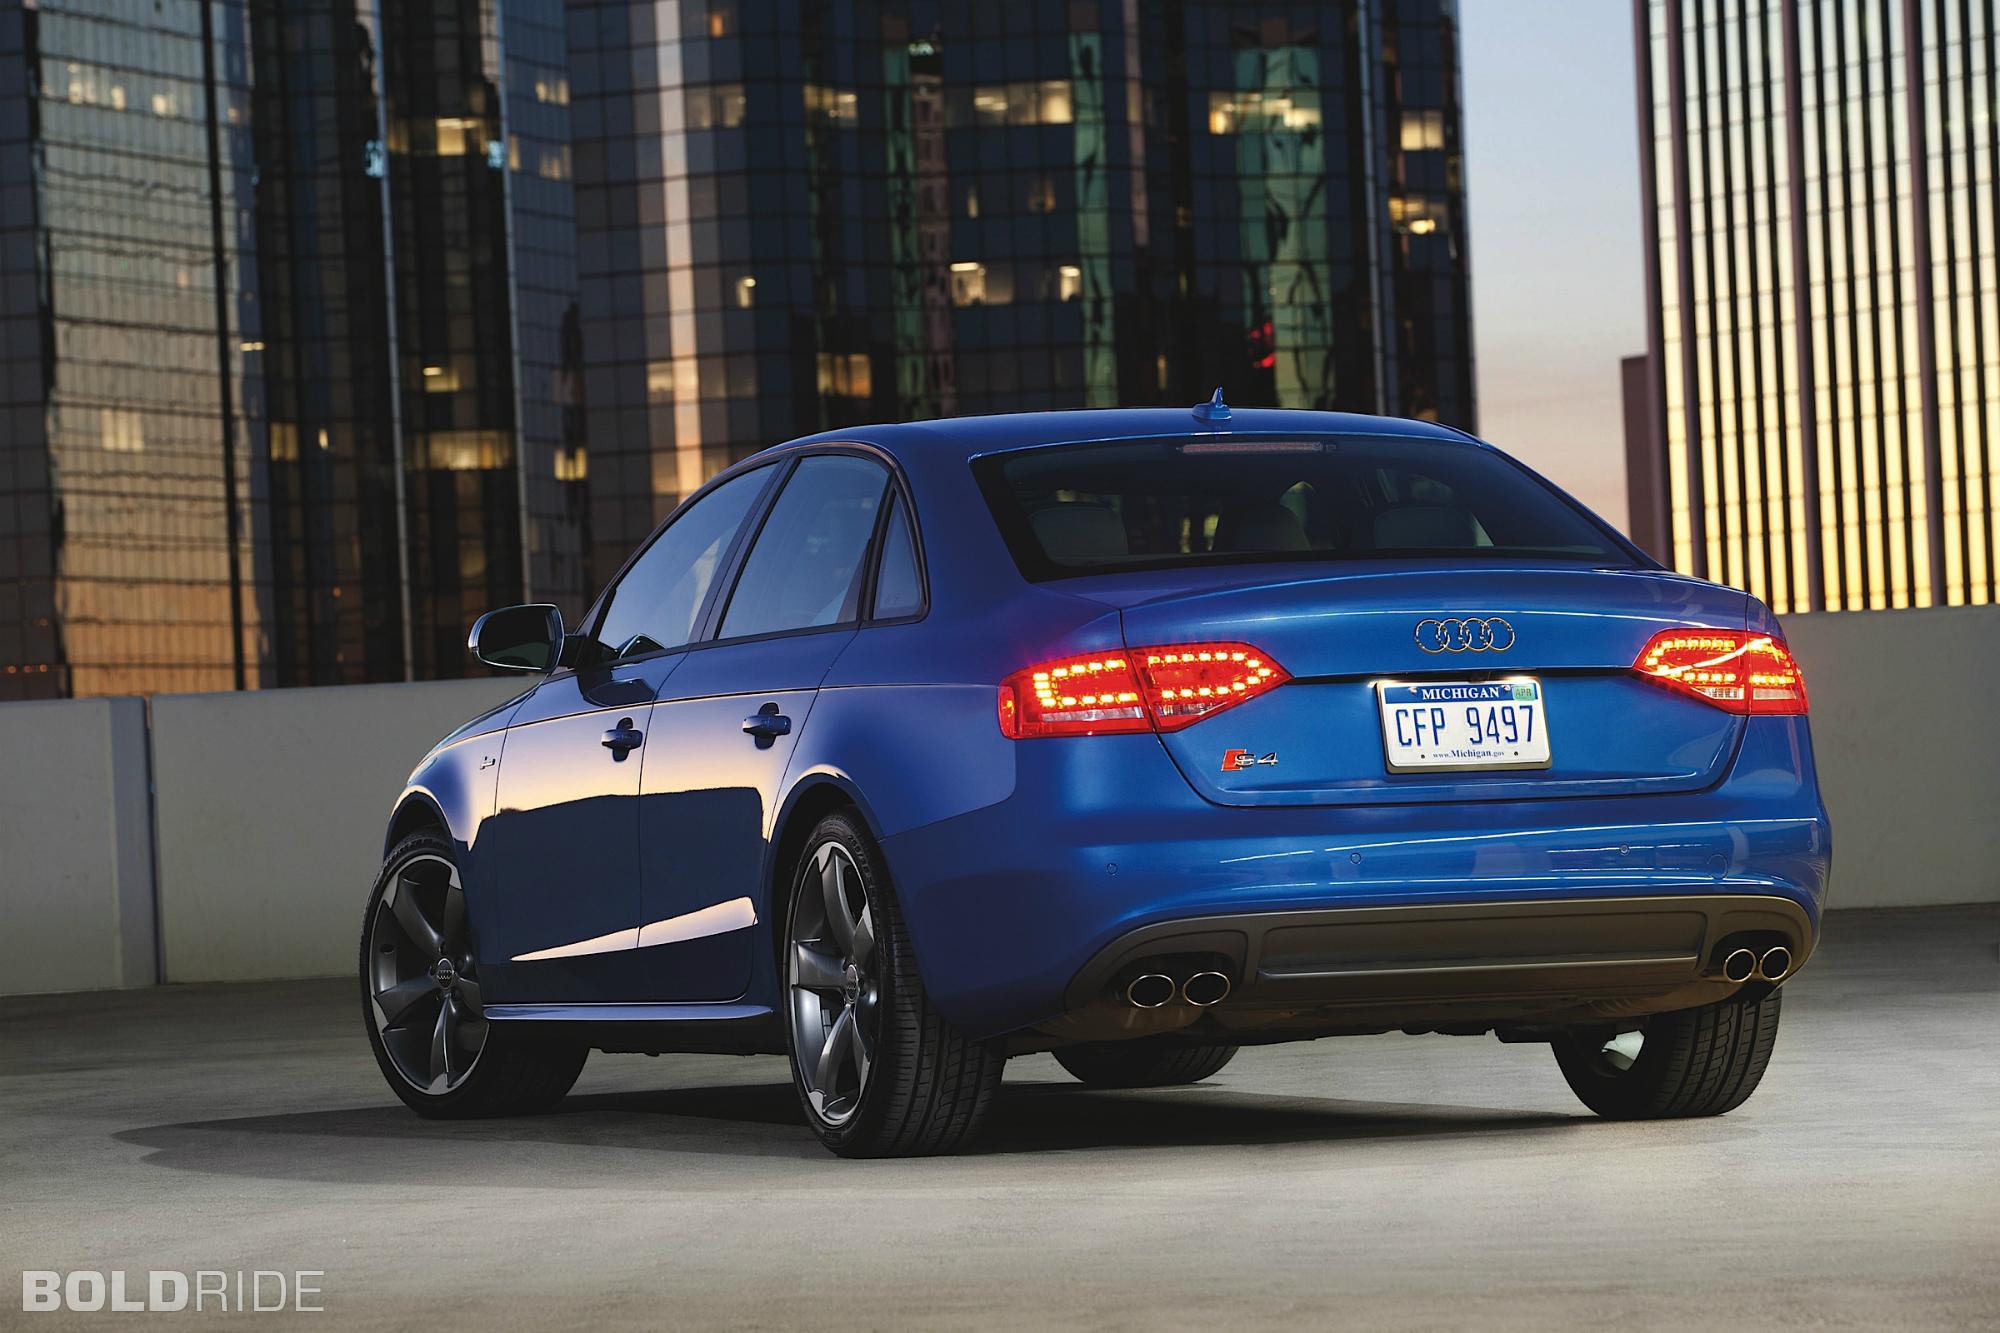 2012 Audi S4 Image 15